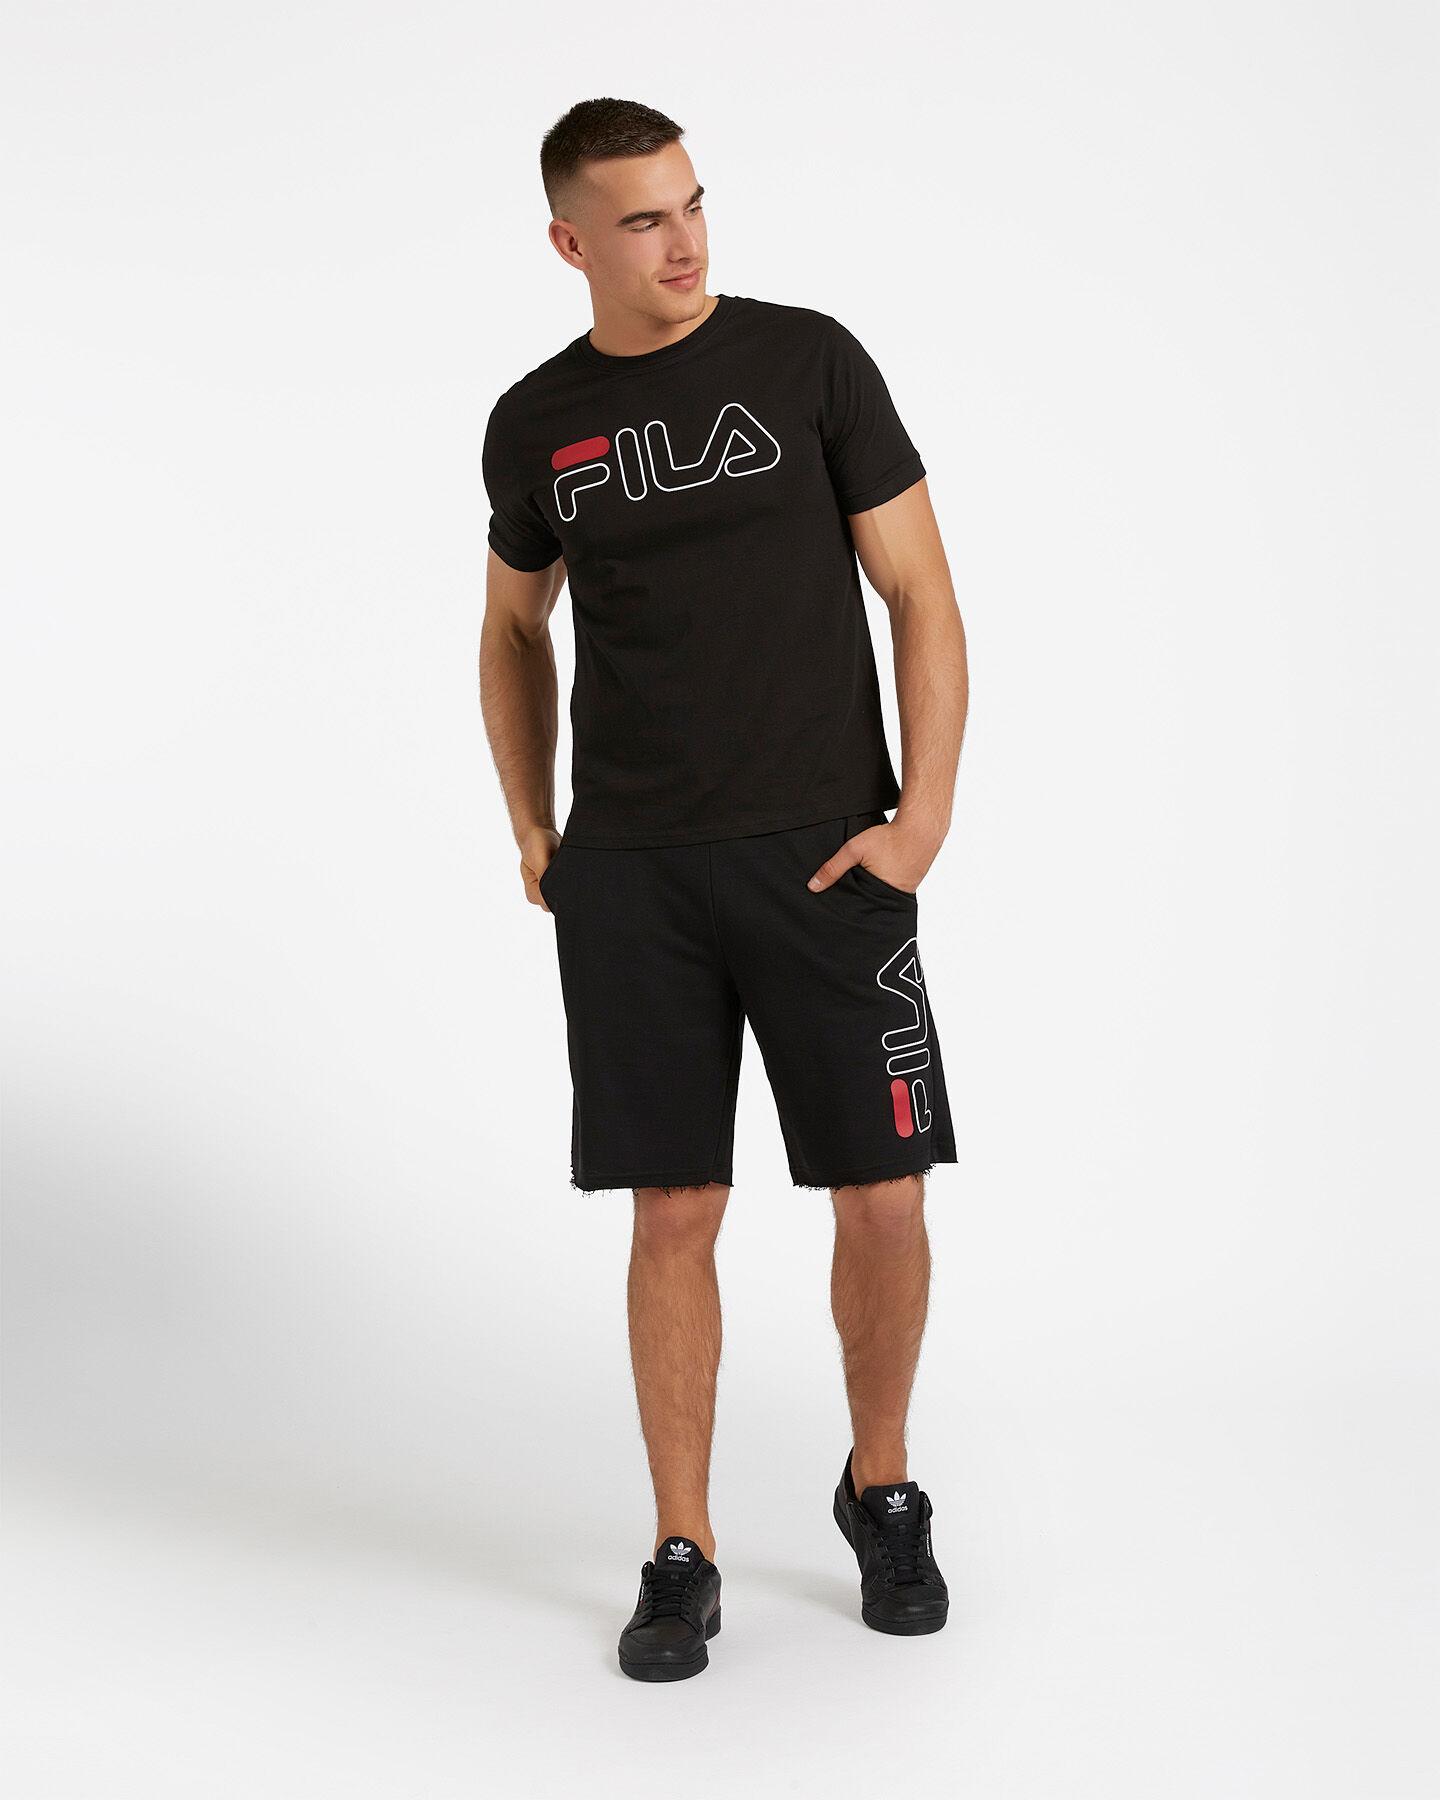 T-Shirt FILA BIG LOGO M S4067077 scatto 1